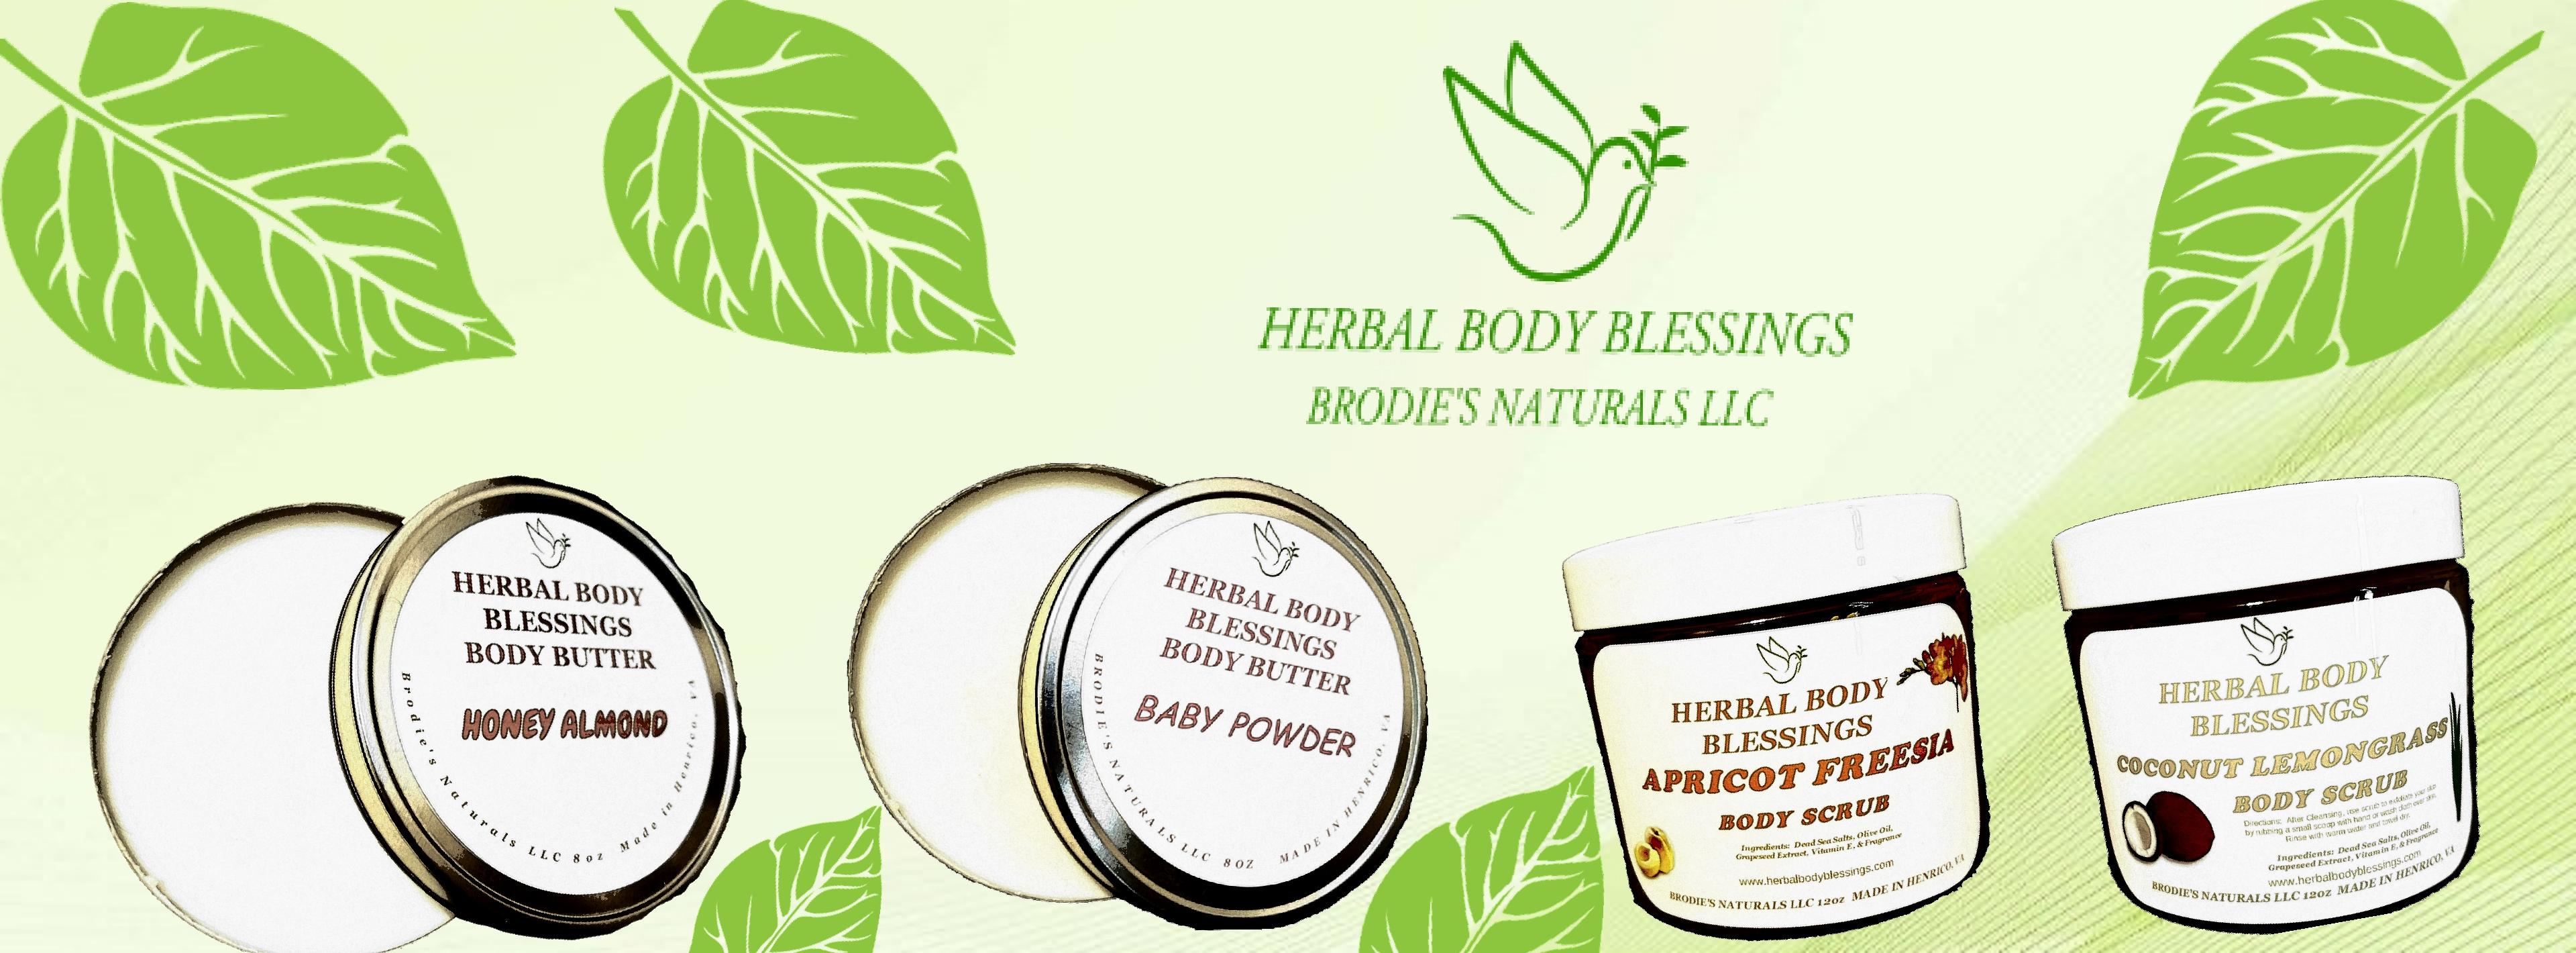 Herbal Body Blessings